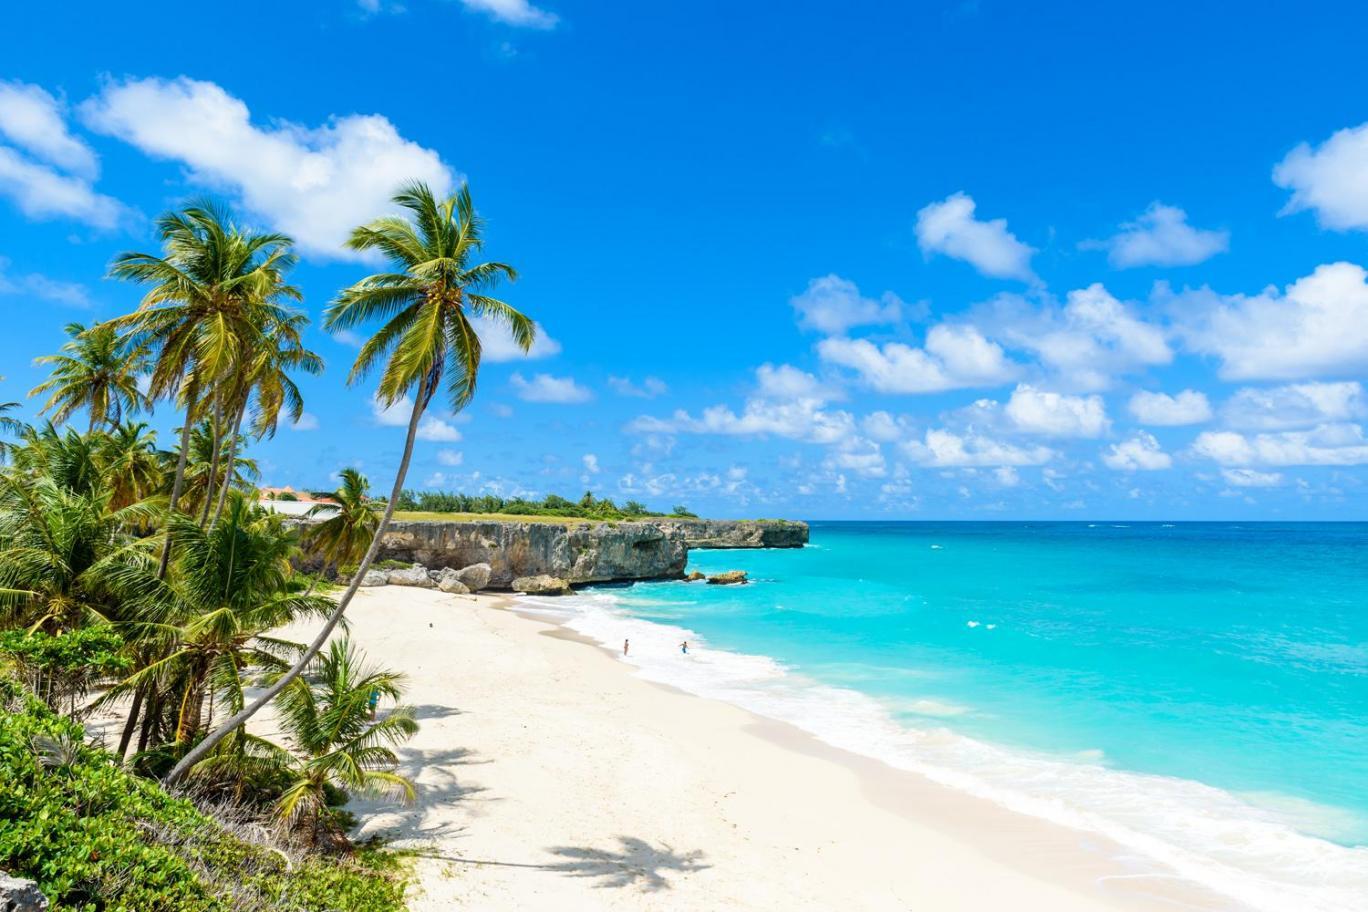 Beaches Of Barbados Cherl12345 Tamara Photo 42082880